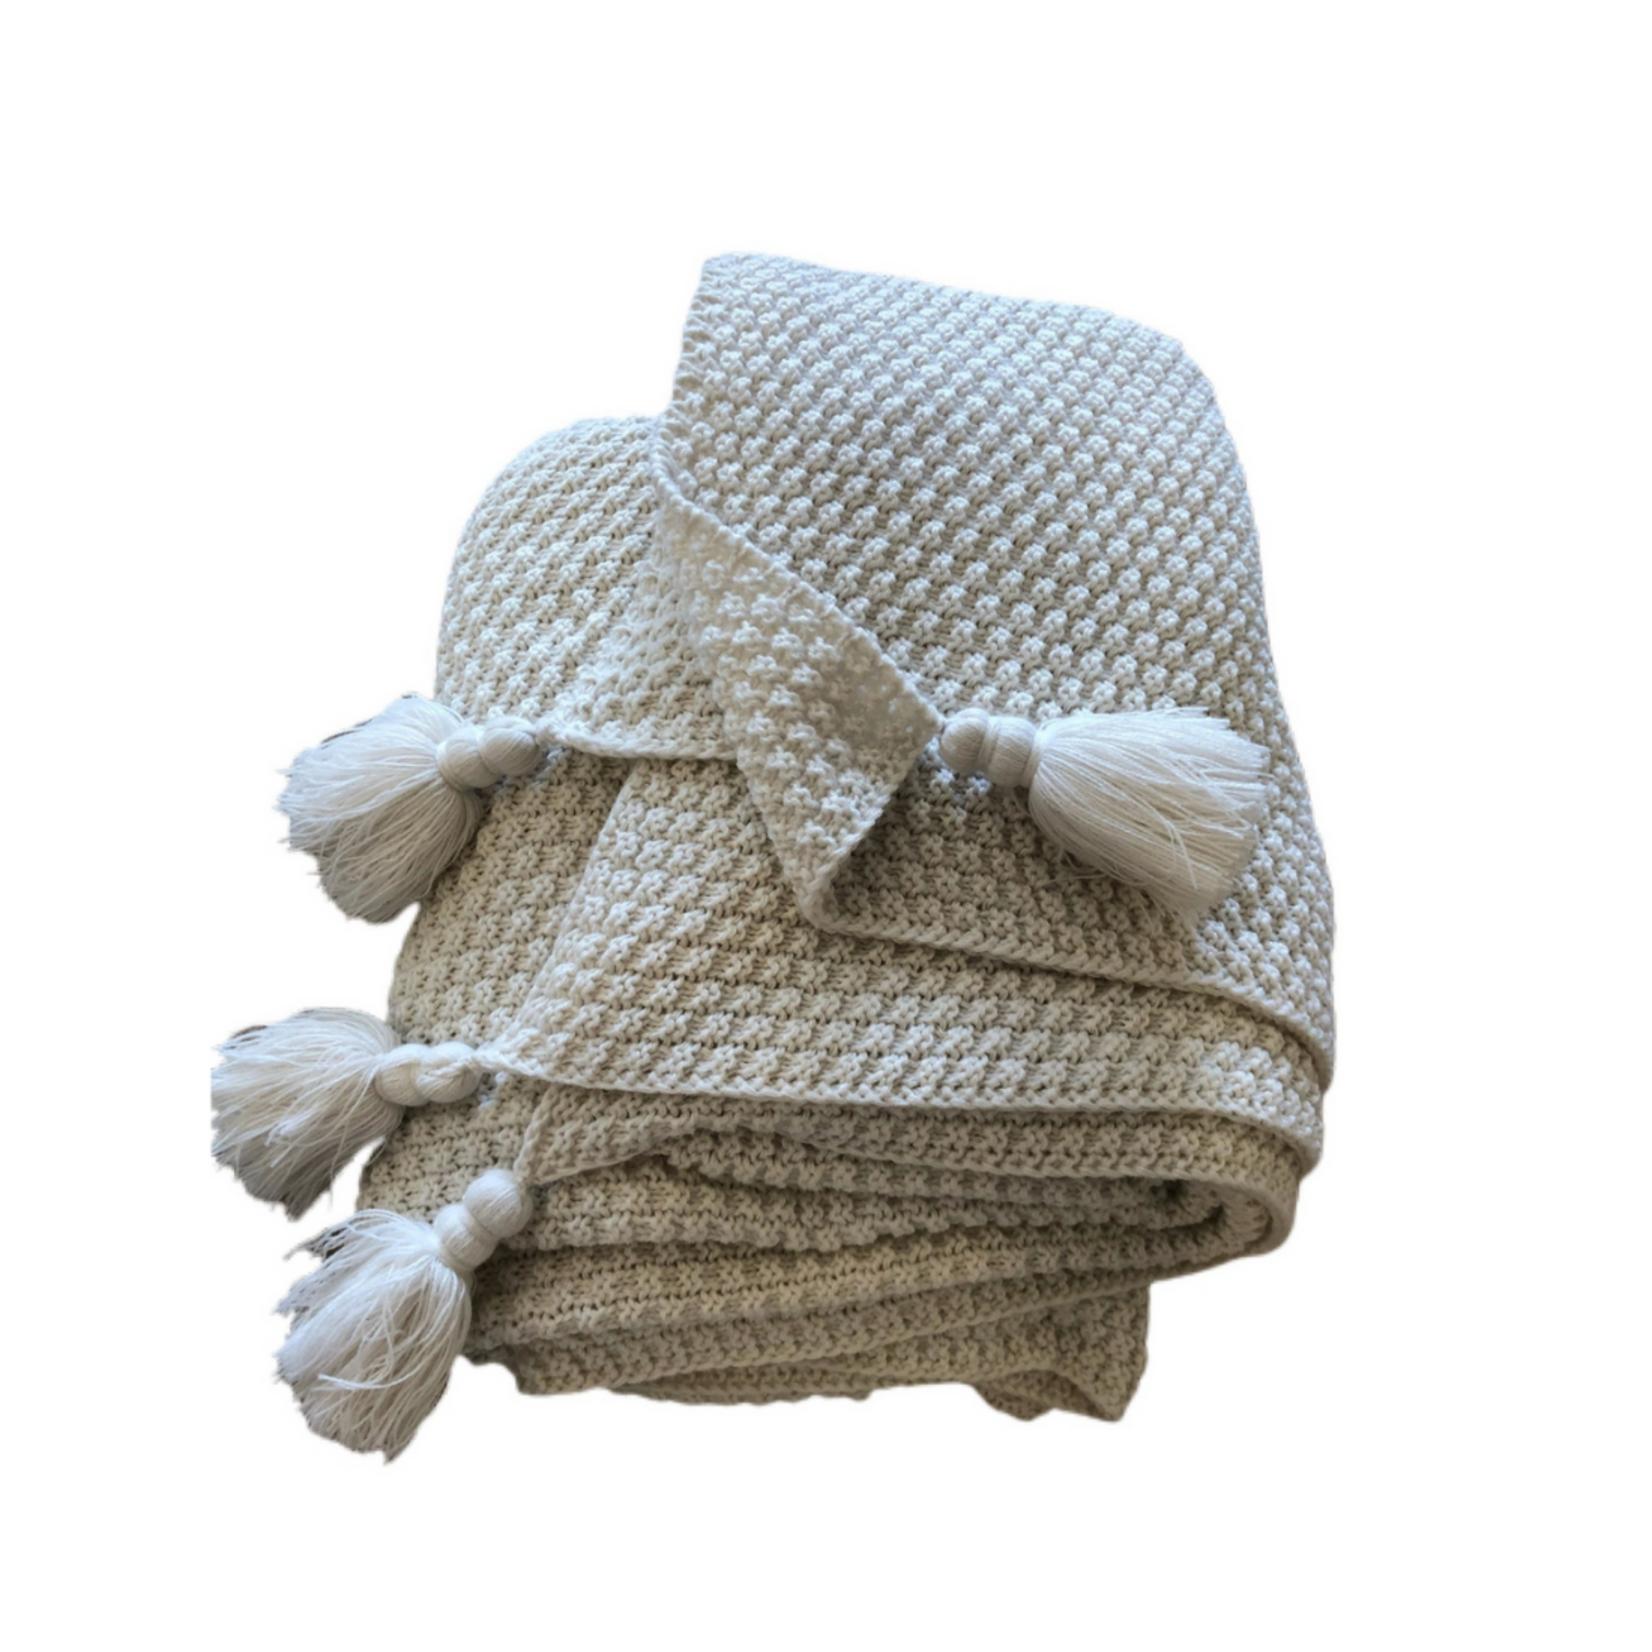 Wyld Blue Home Knit Blanket White